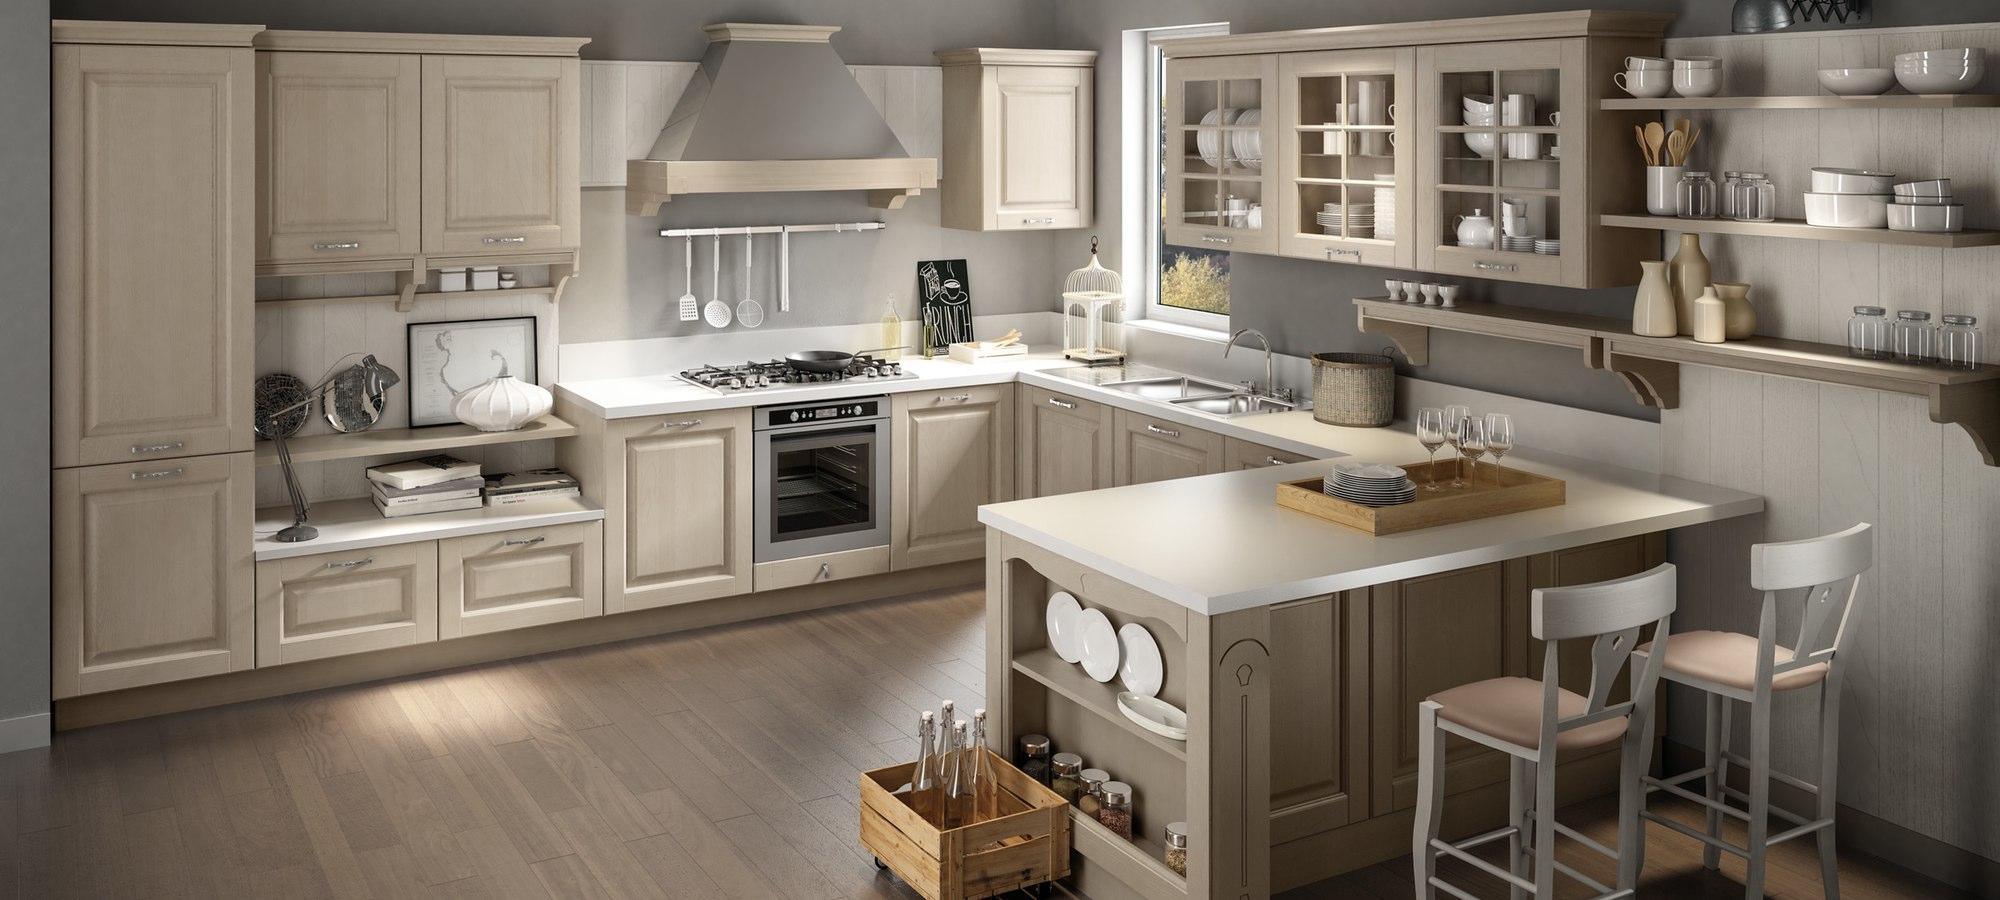 Cucine Classiche – Pagina 4 – Brennero Case Stili di Maistri ...